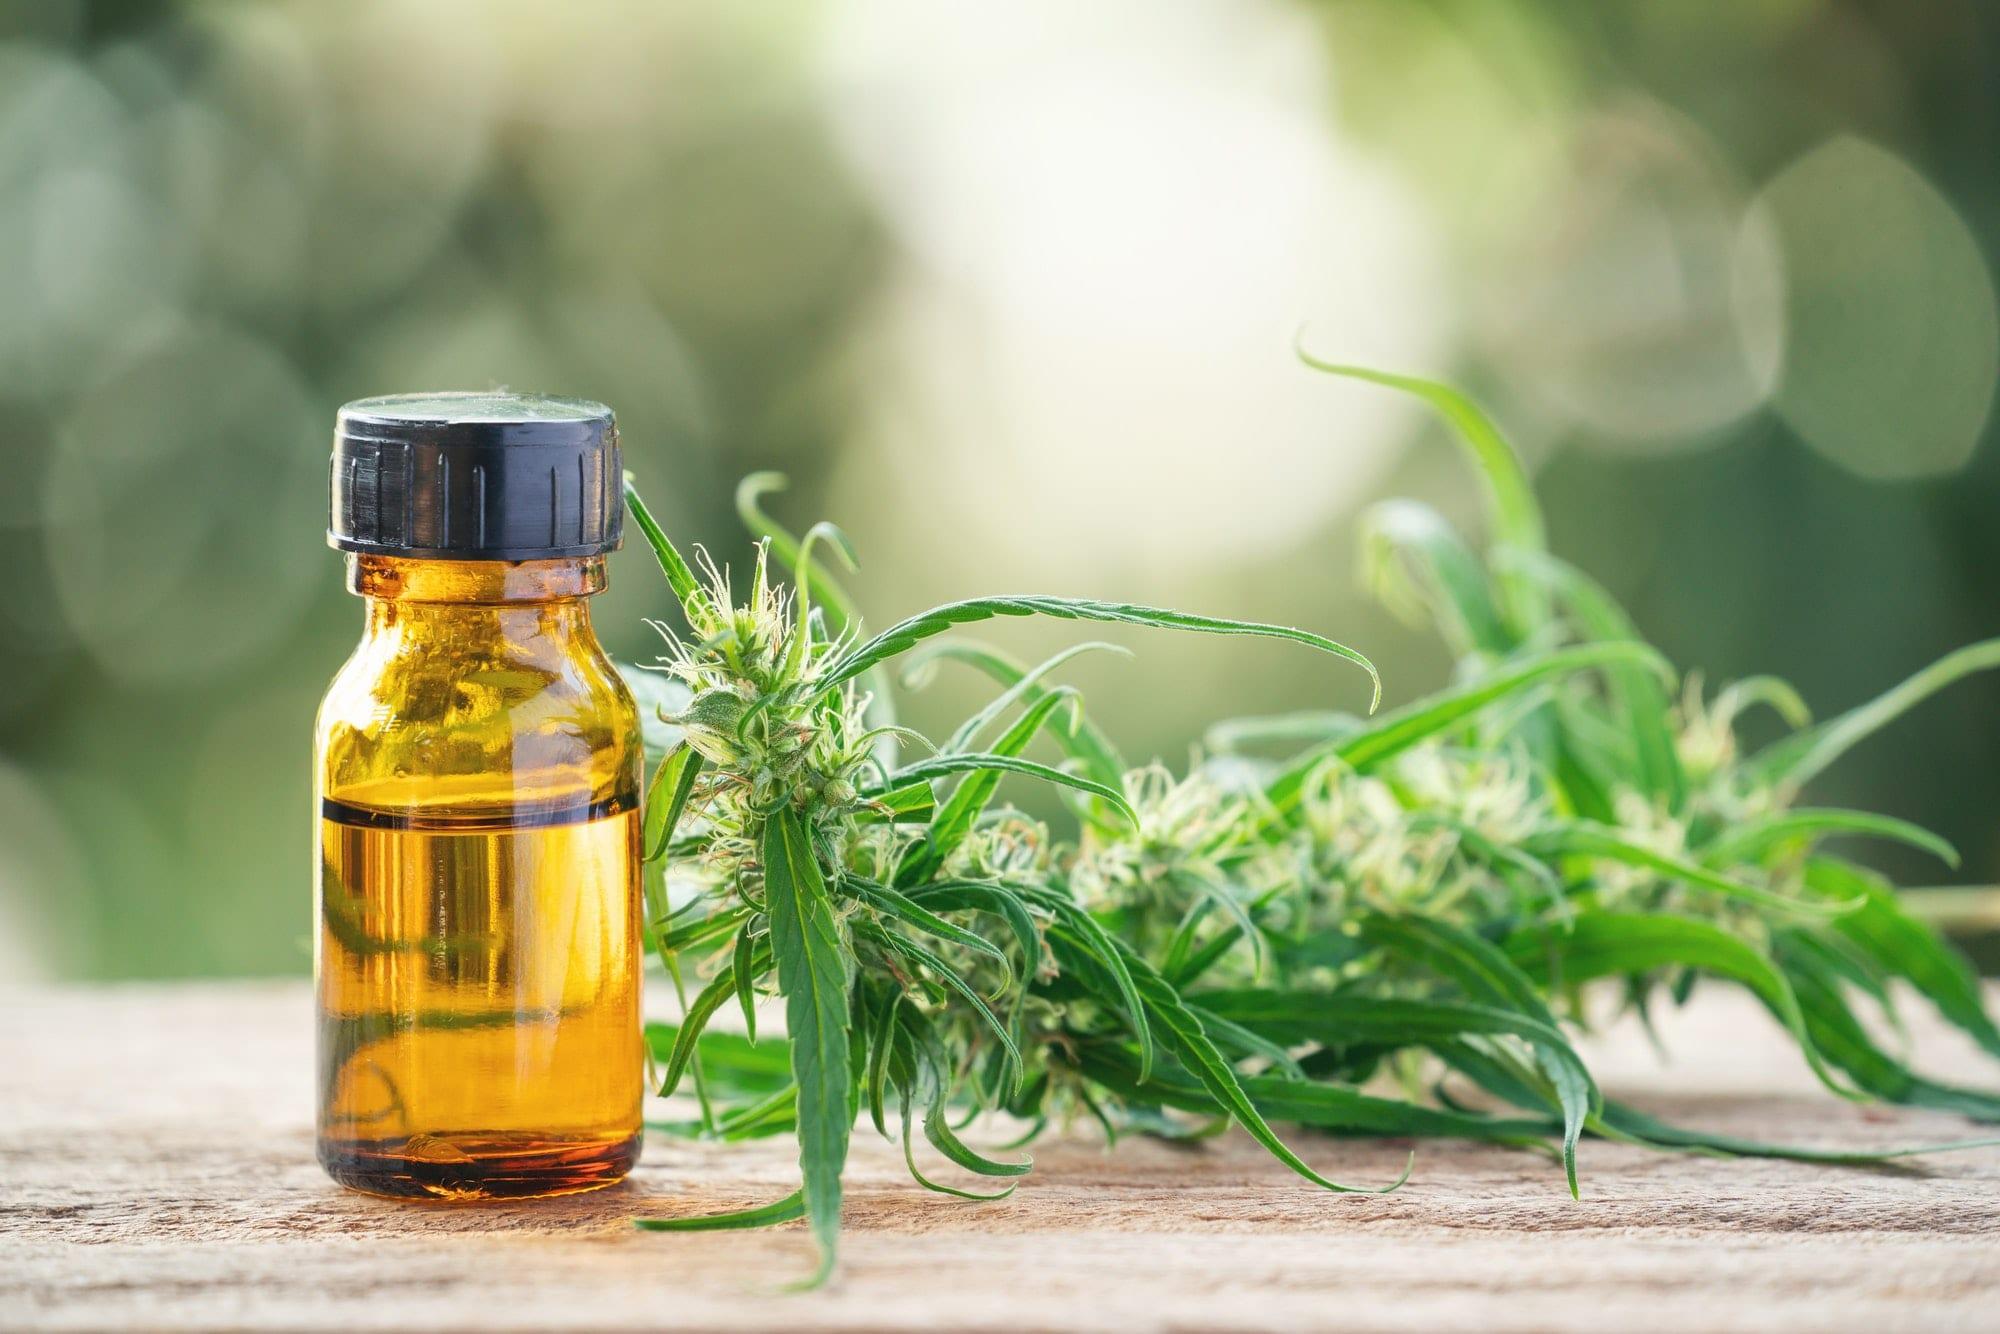 cannabis with cannabidiol (cbd) extract in a shopping cart